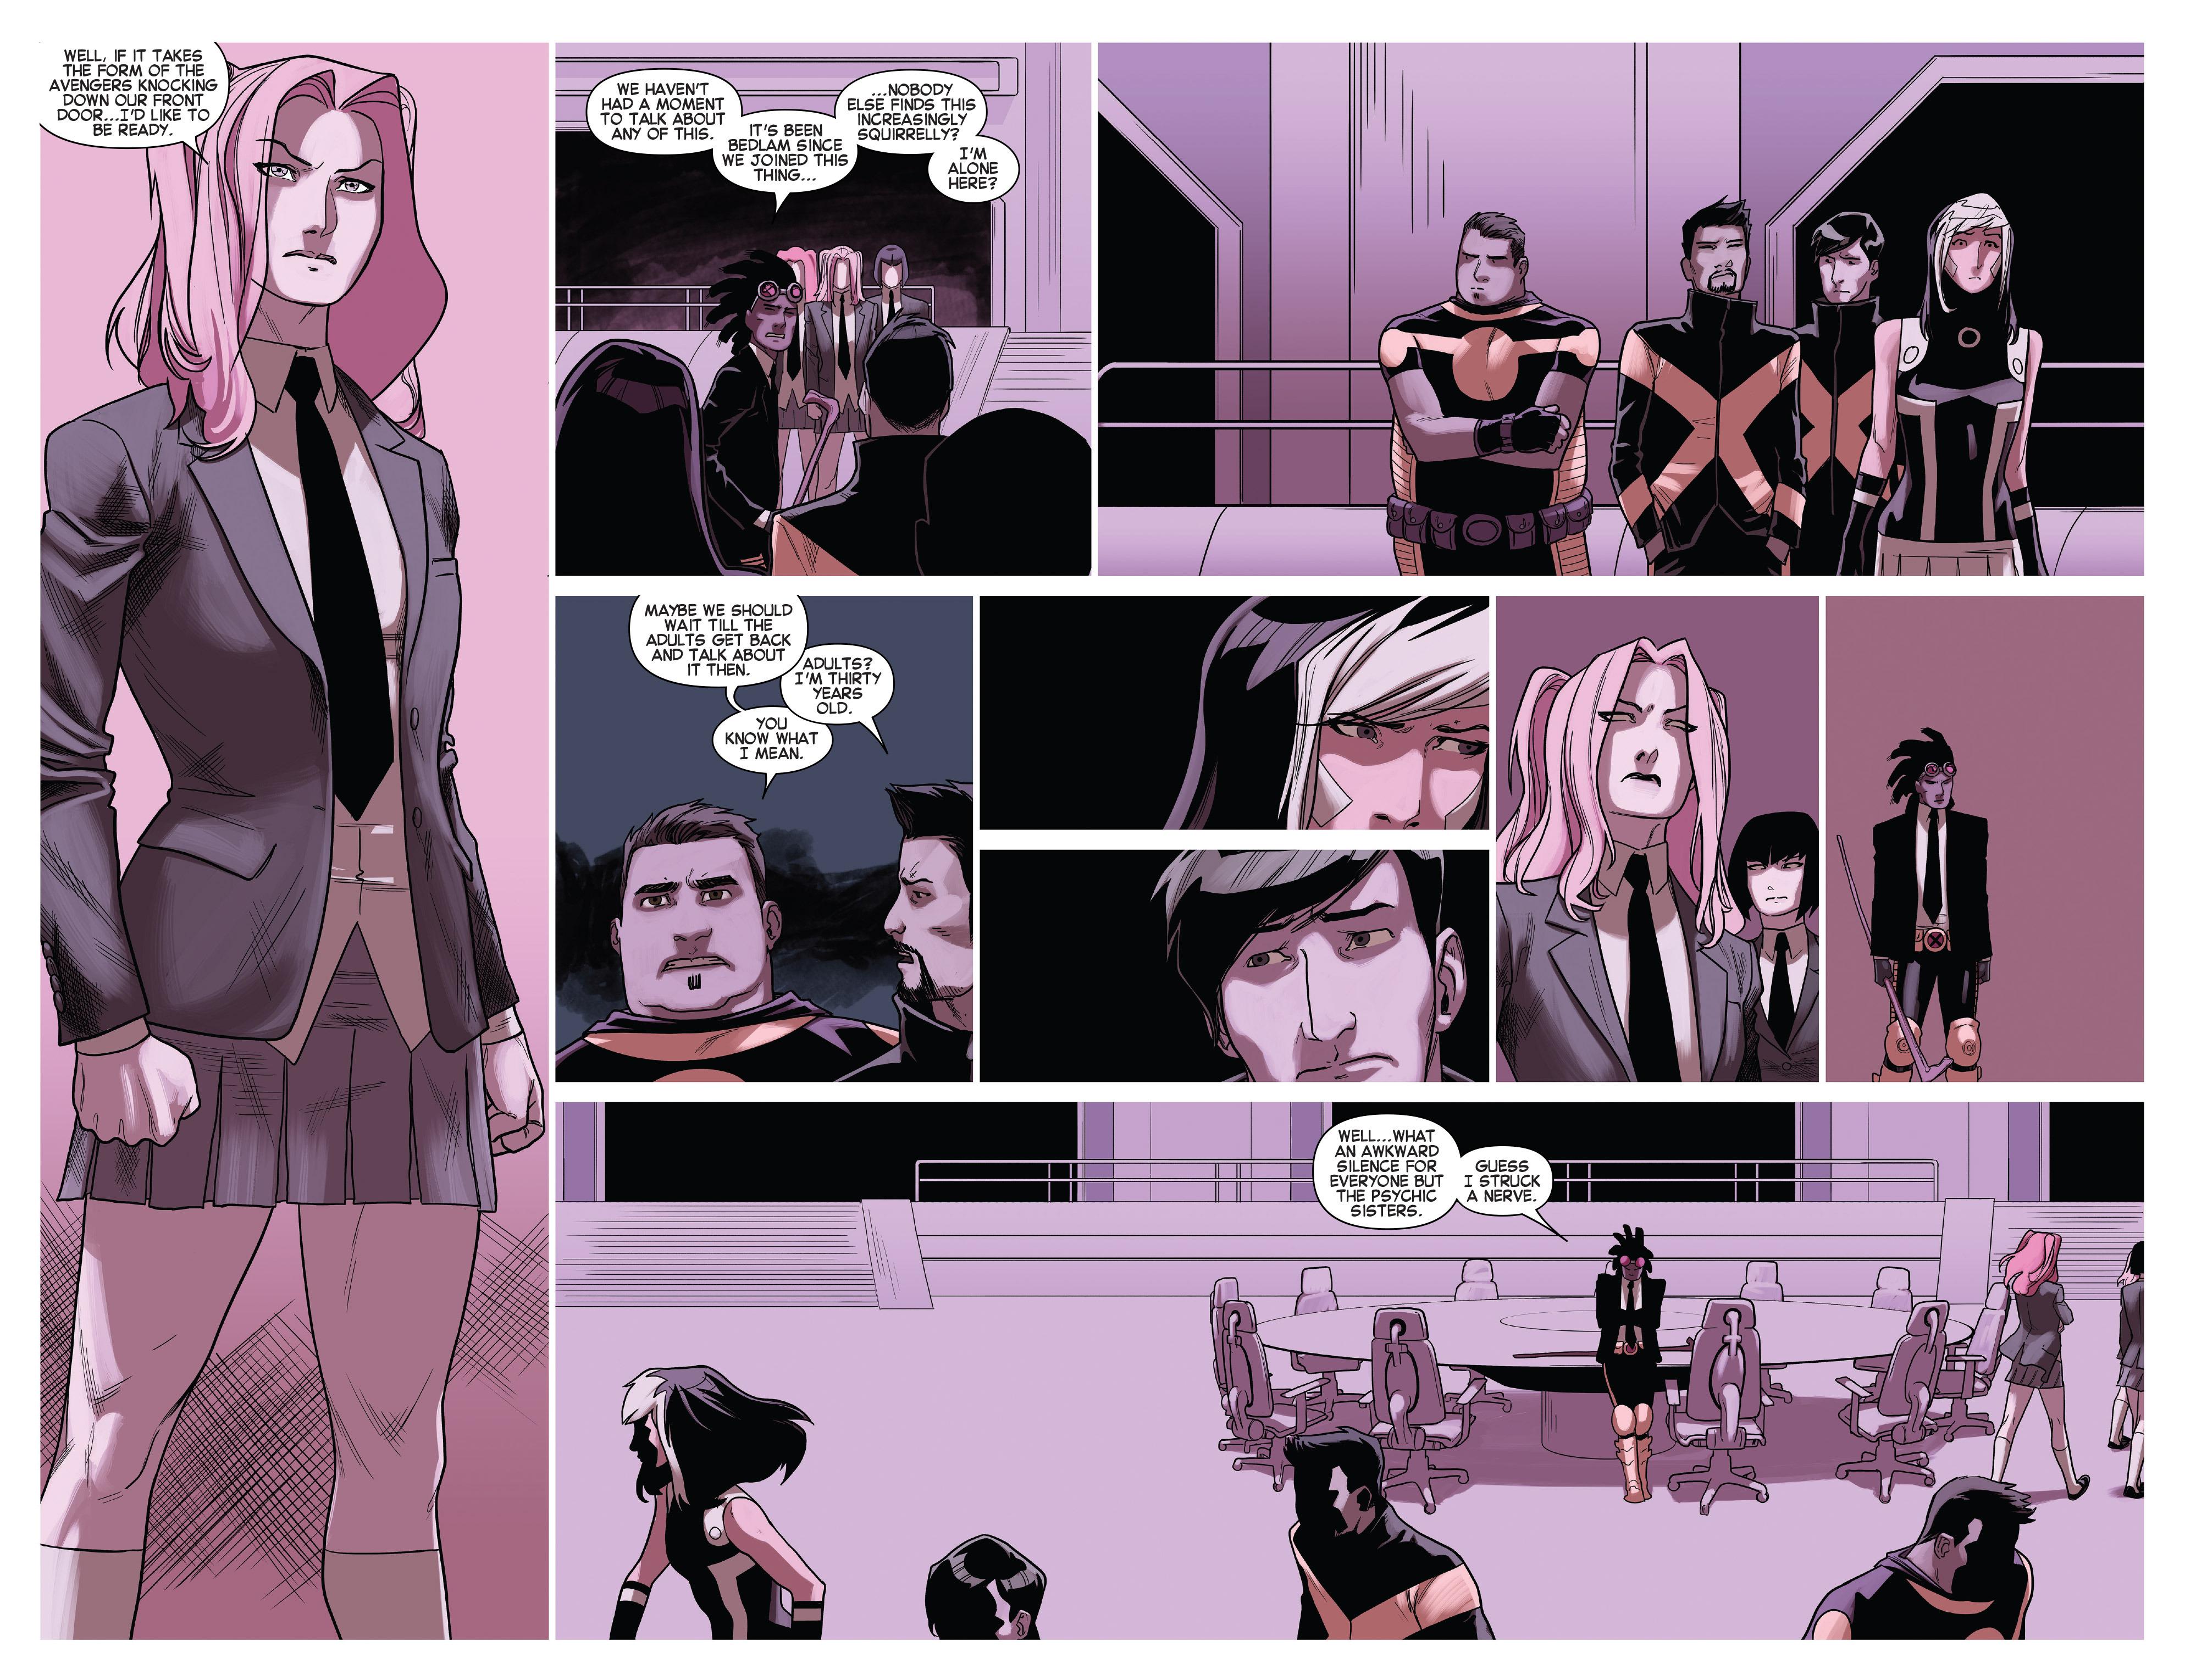 Read online Uncanny X-Men (2013) comic -  Issue # _TPB 5 - The Omega Mutant - 17